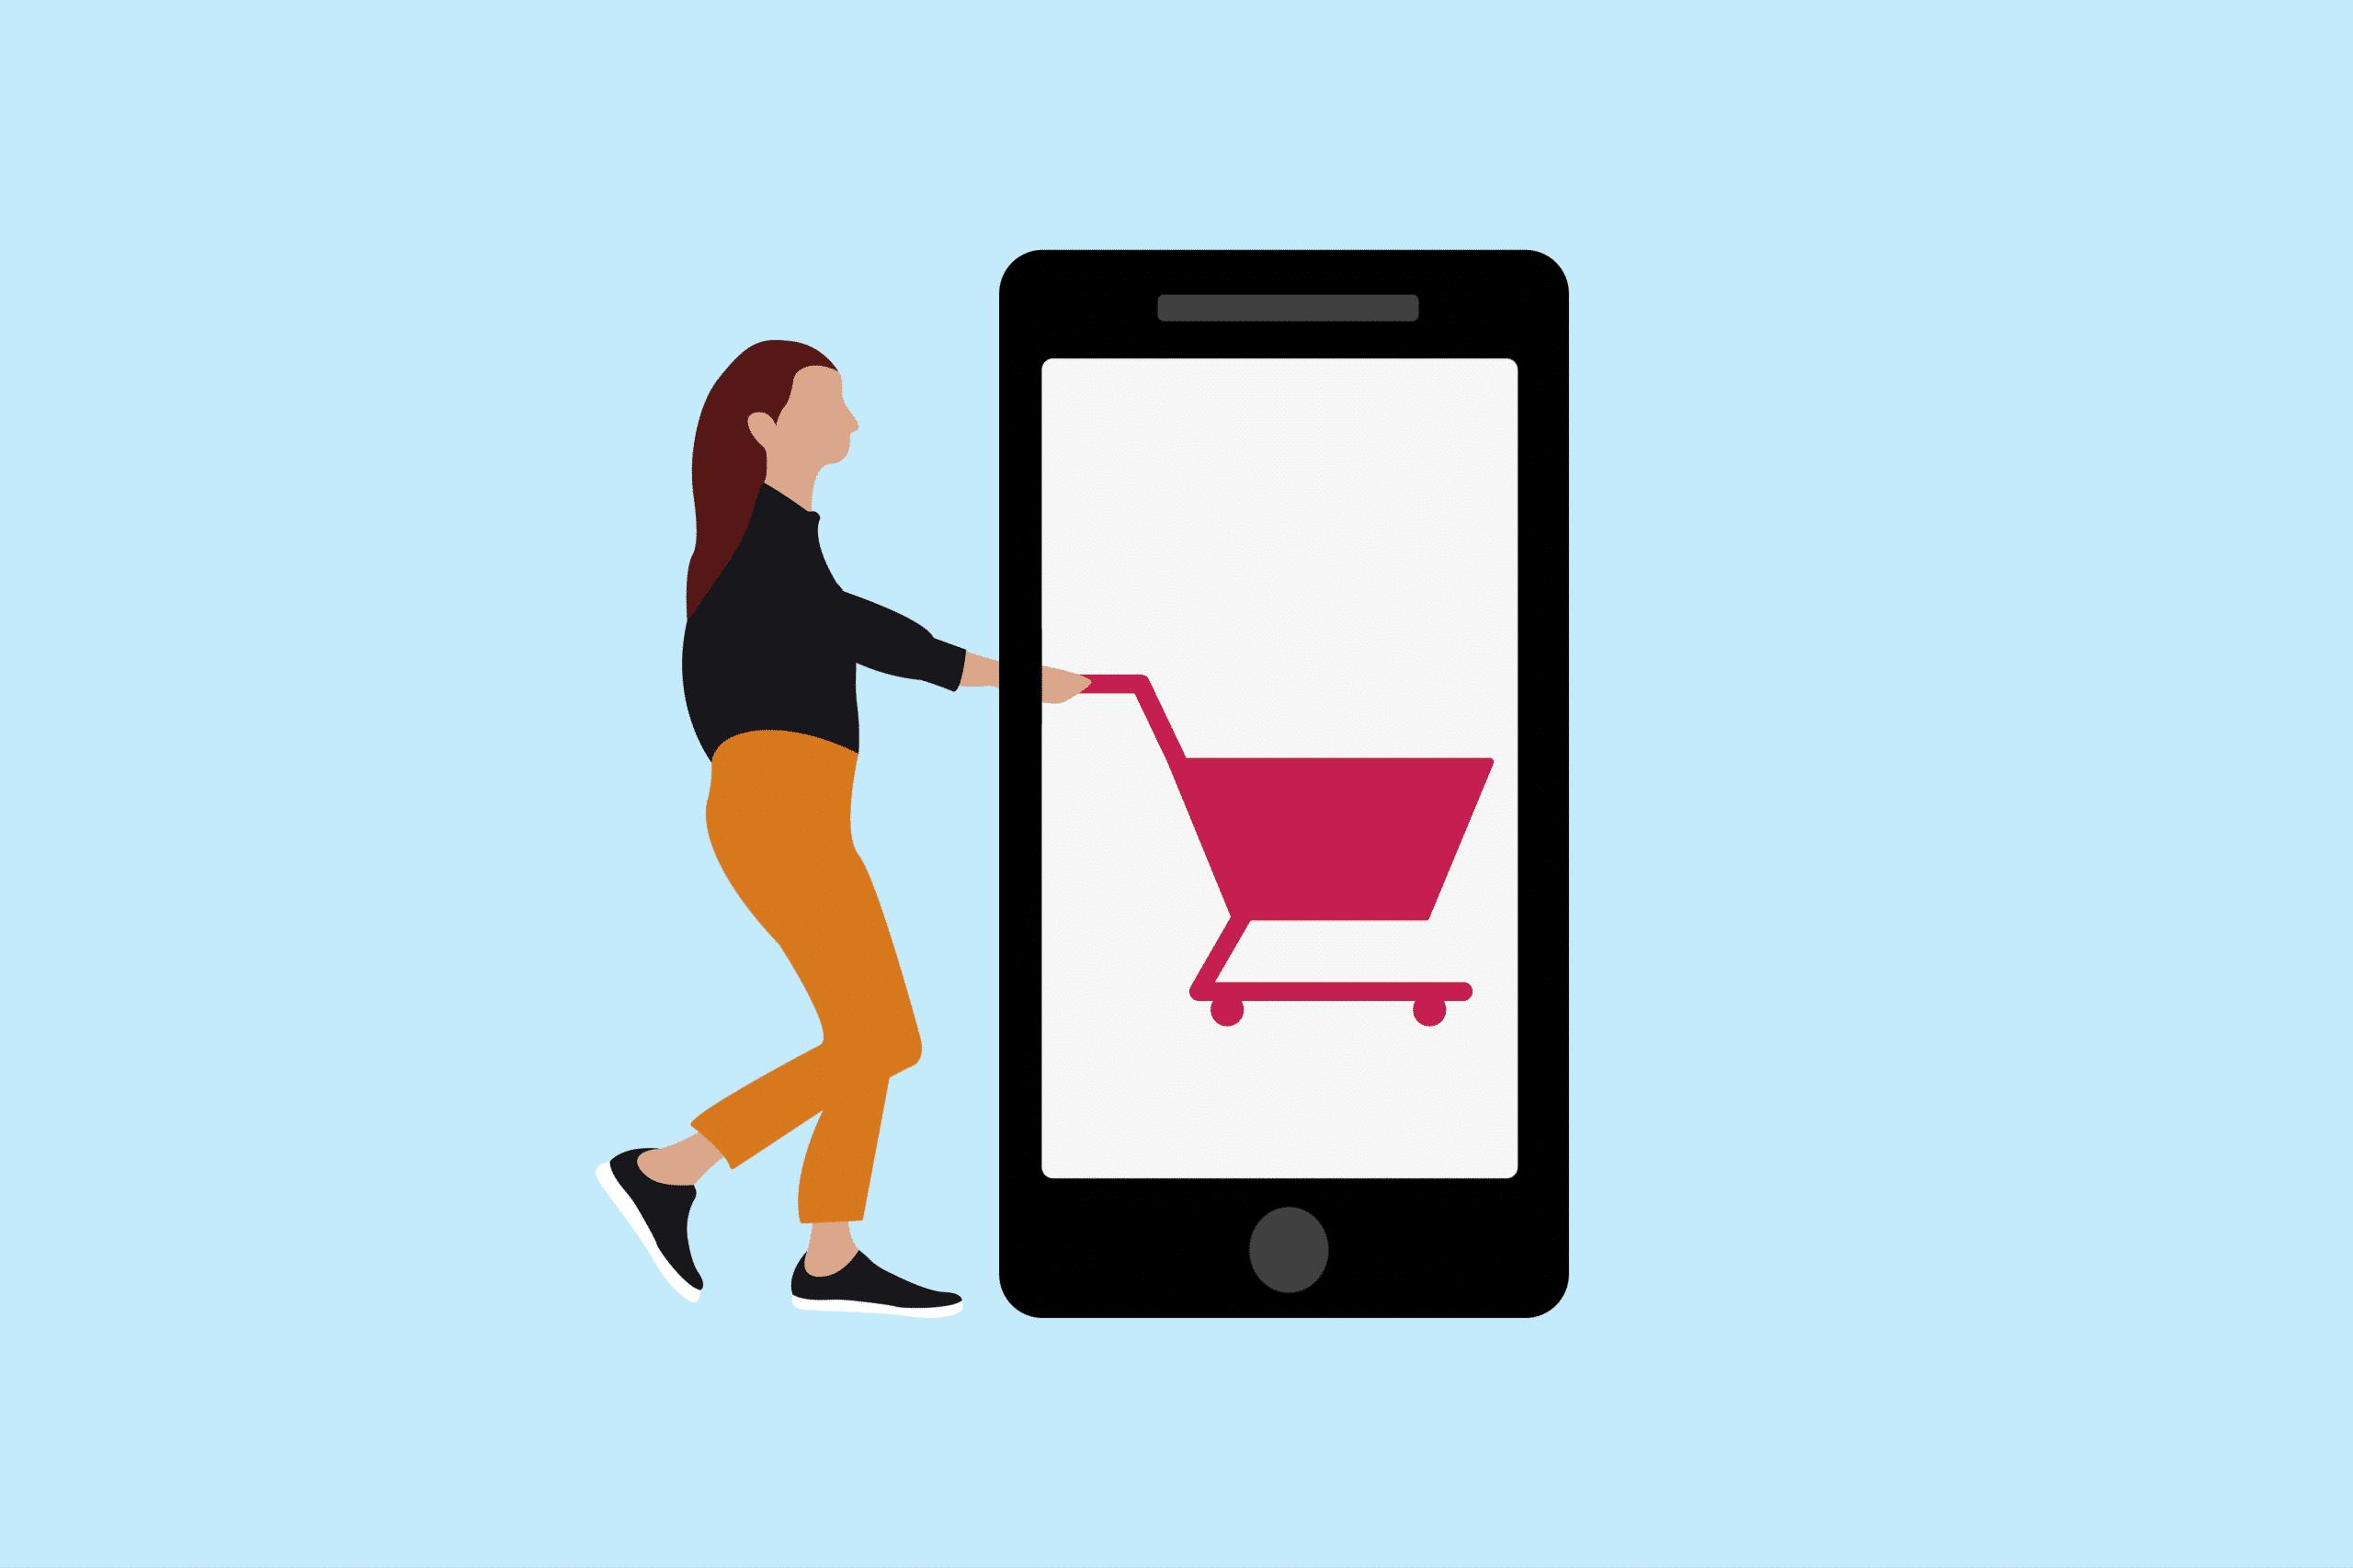 Sale cart - Generating sales via social media